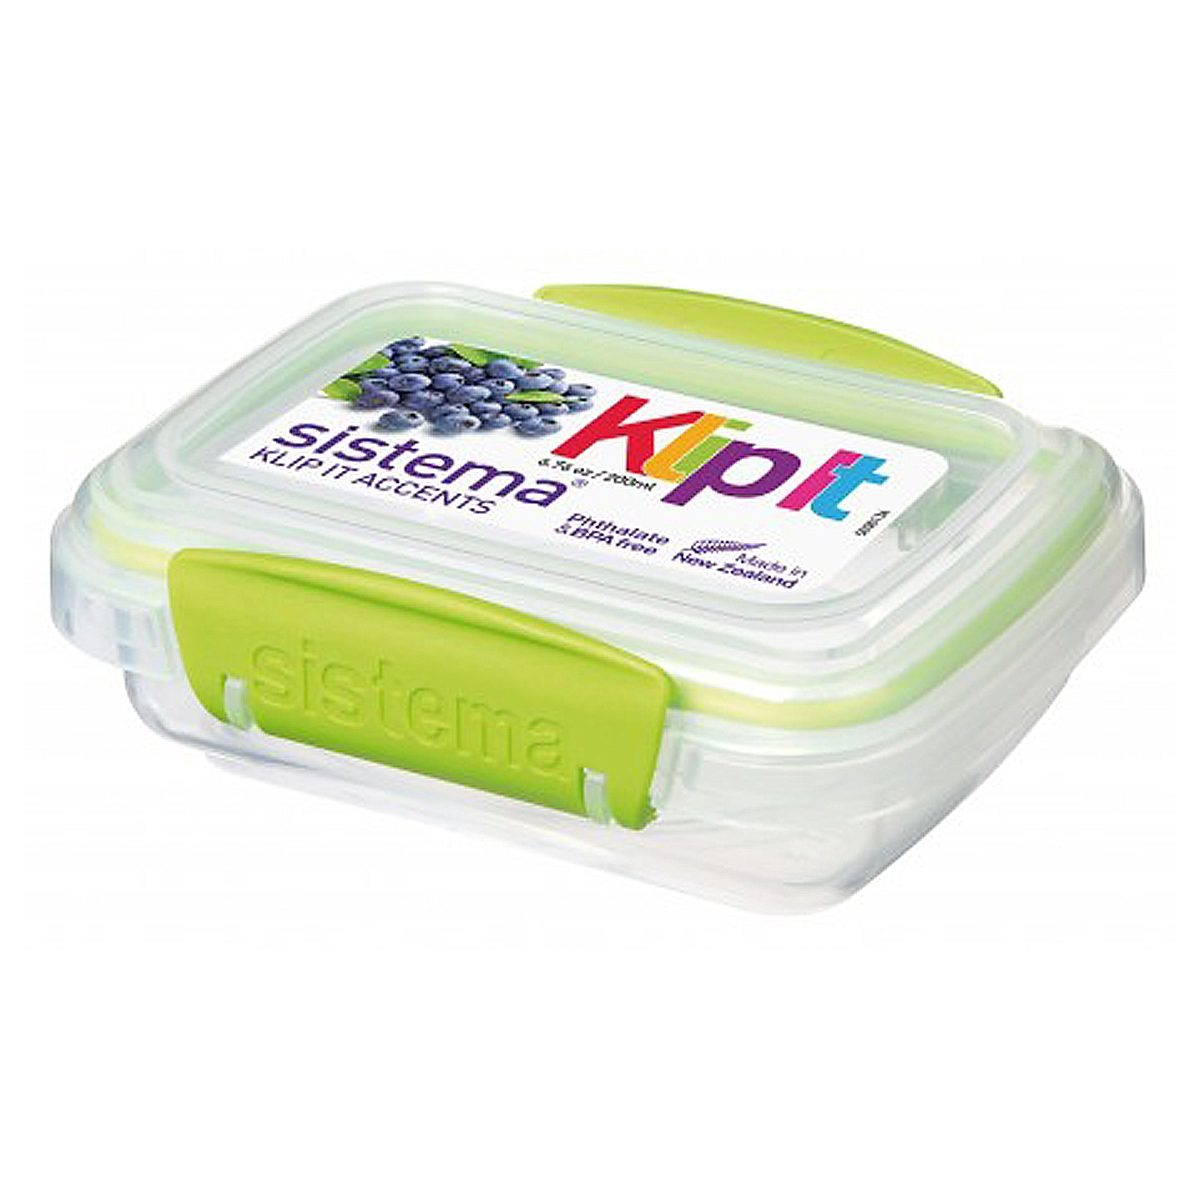 sistema sistema Frischhaltedose Klip it accents, 0.2 l grün